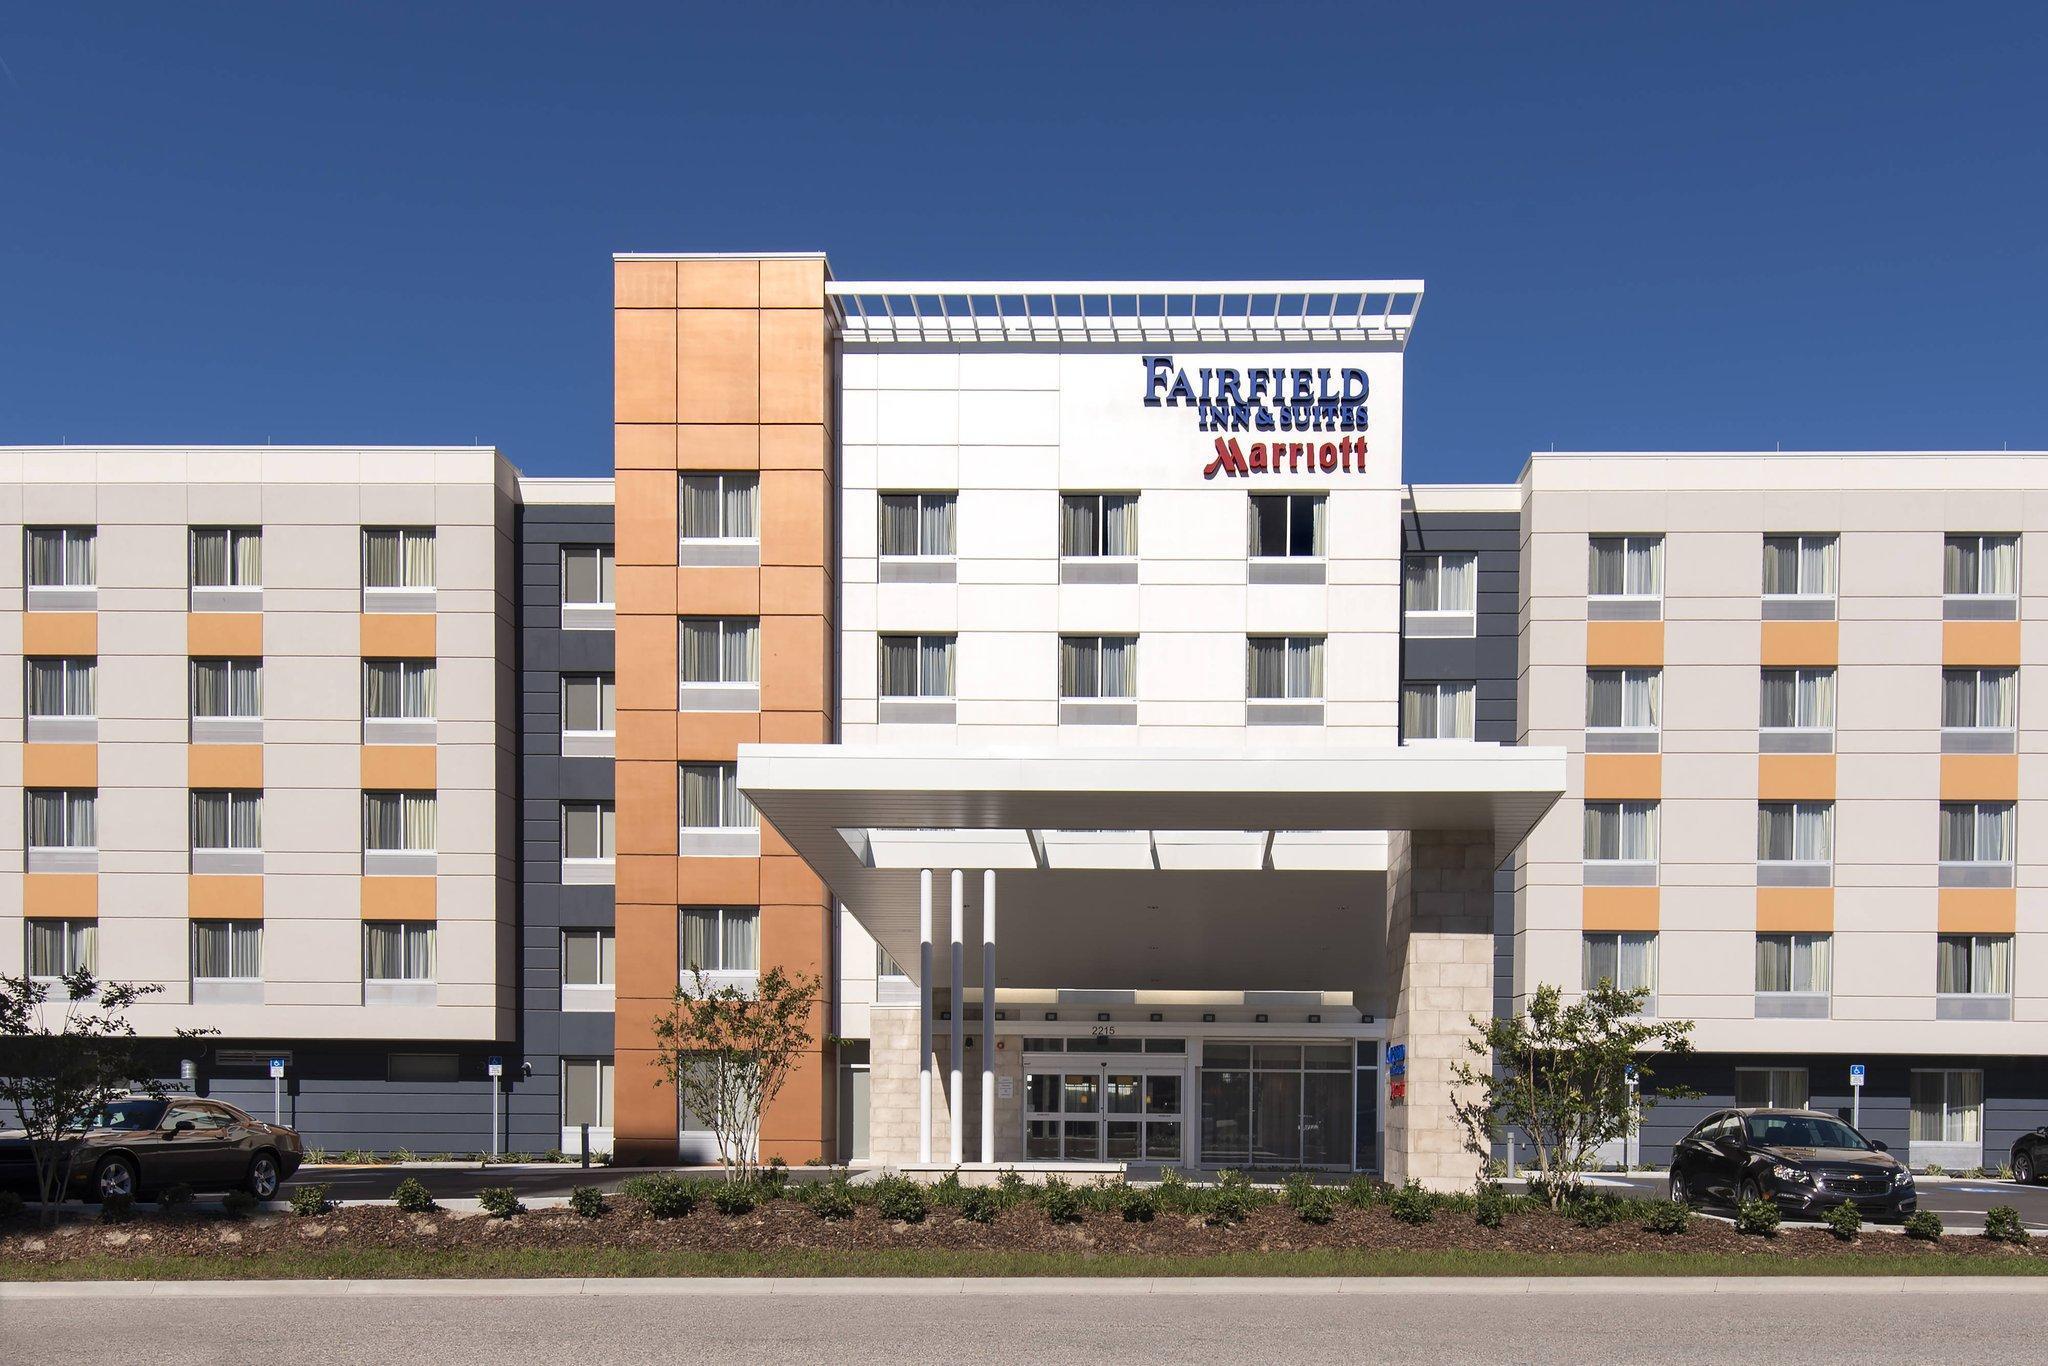 Fairfield Inn And Suites Tampa Westshore Airport